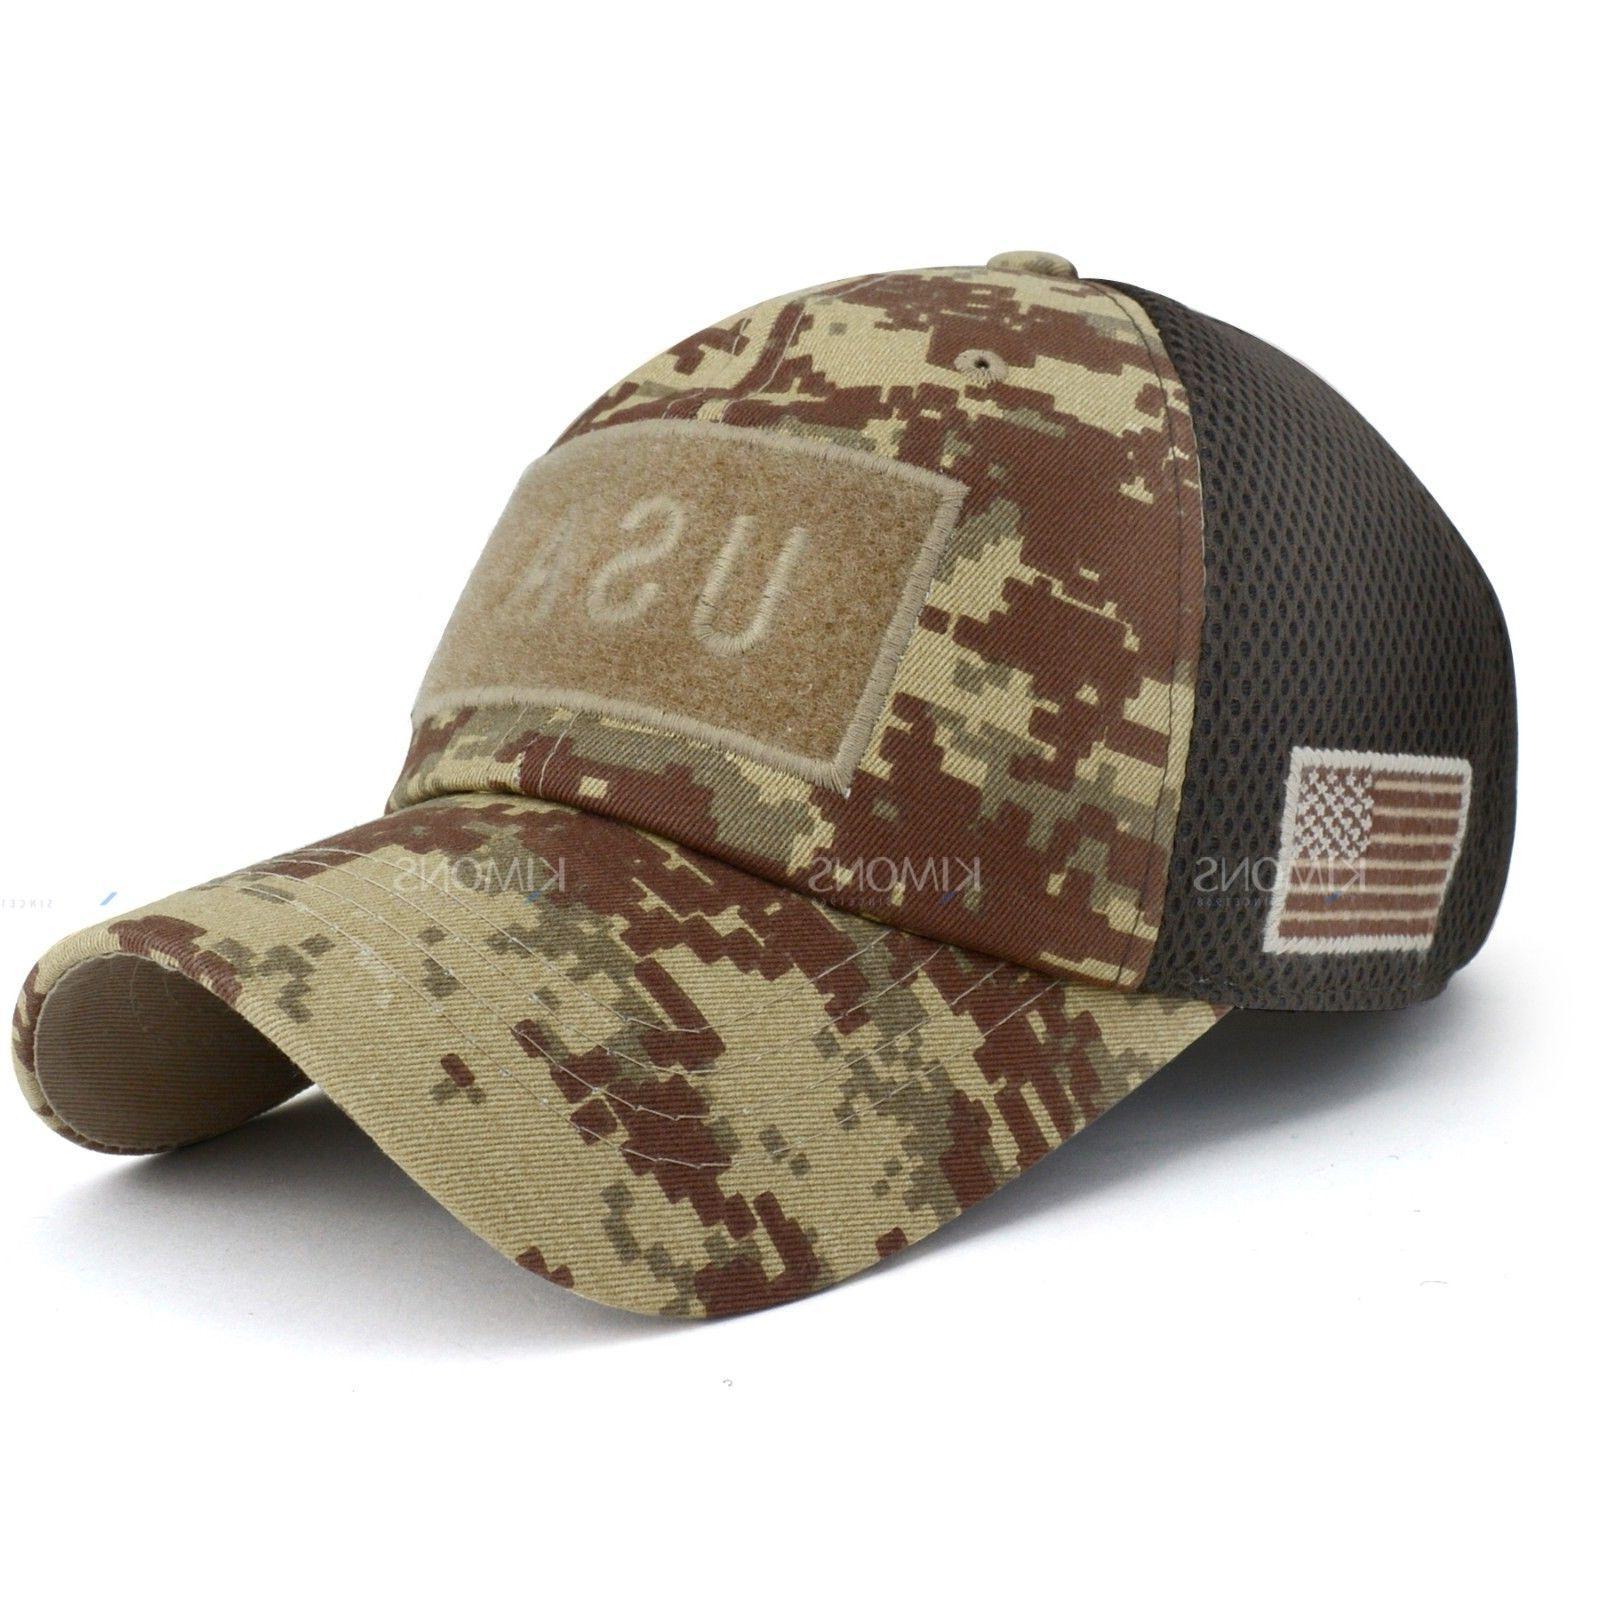 USA American Flag Detachable Military cap